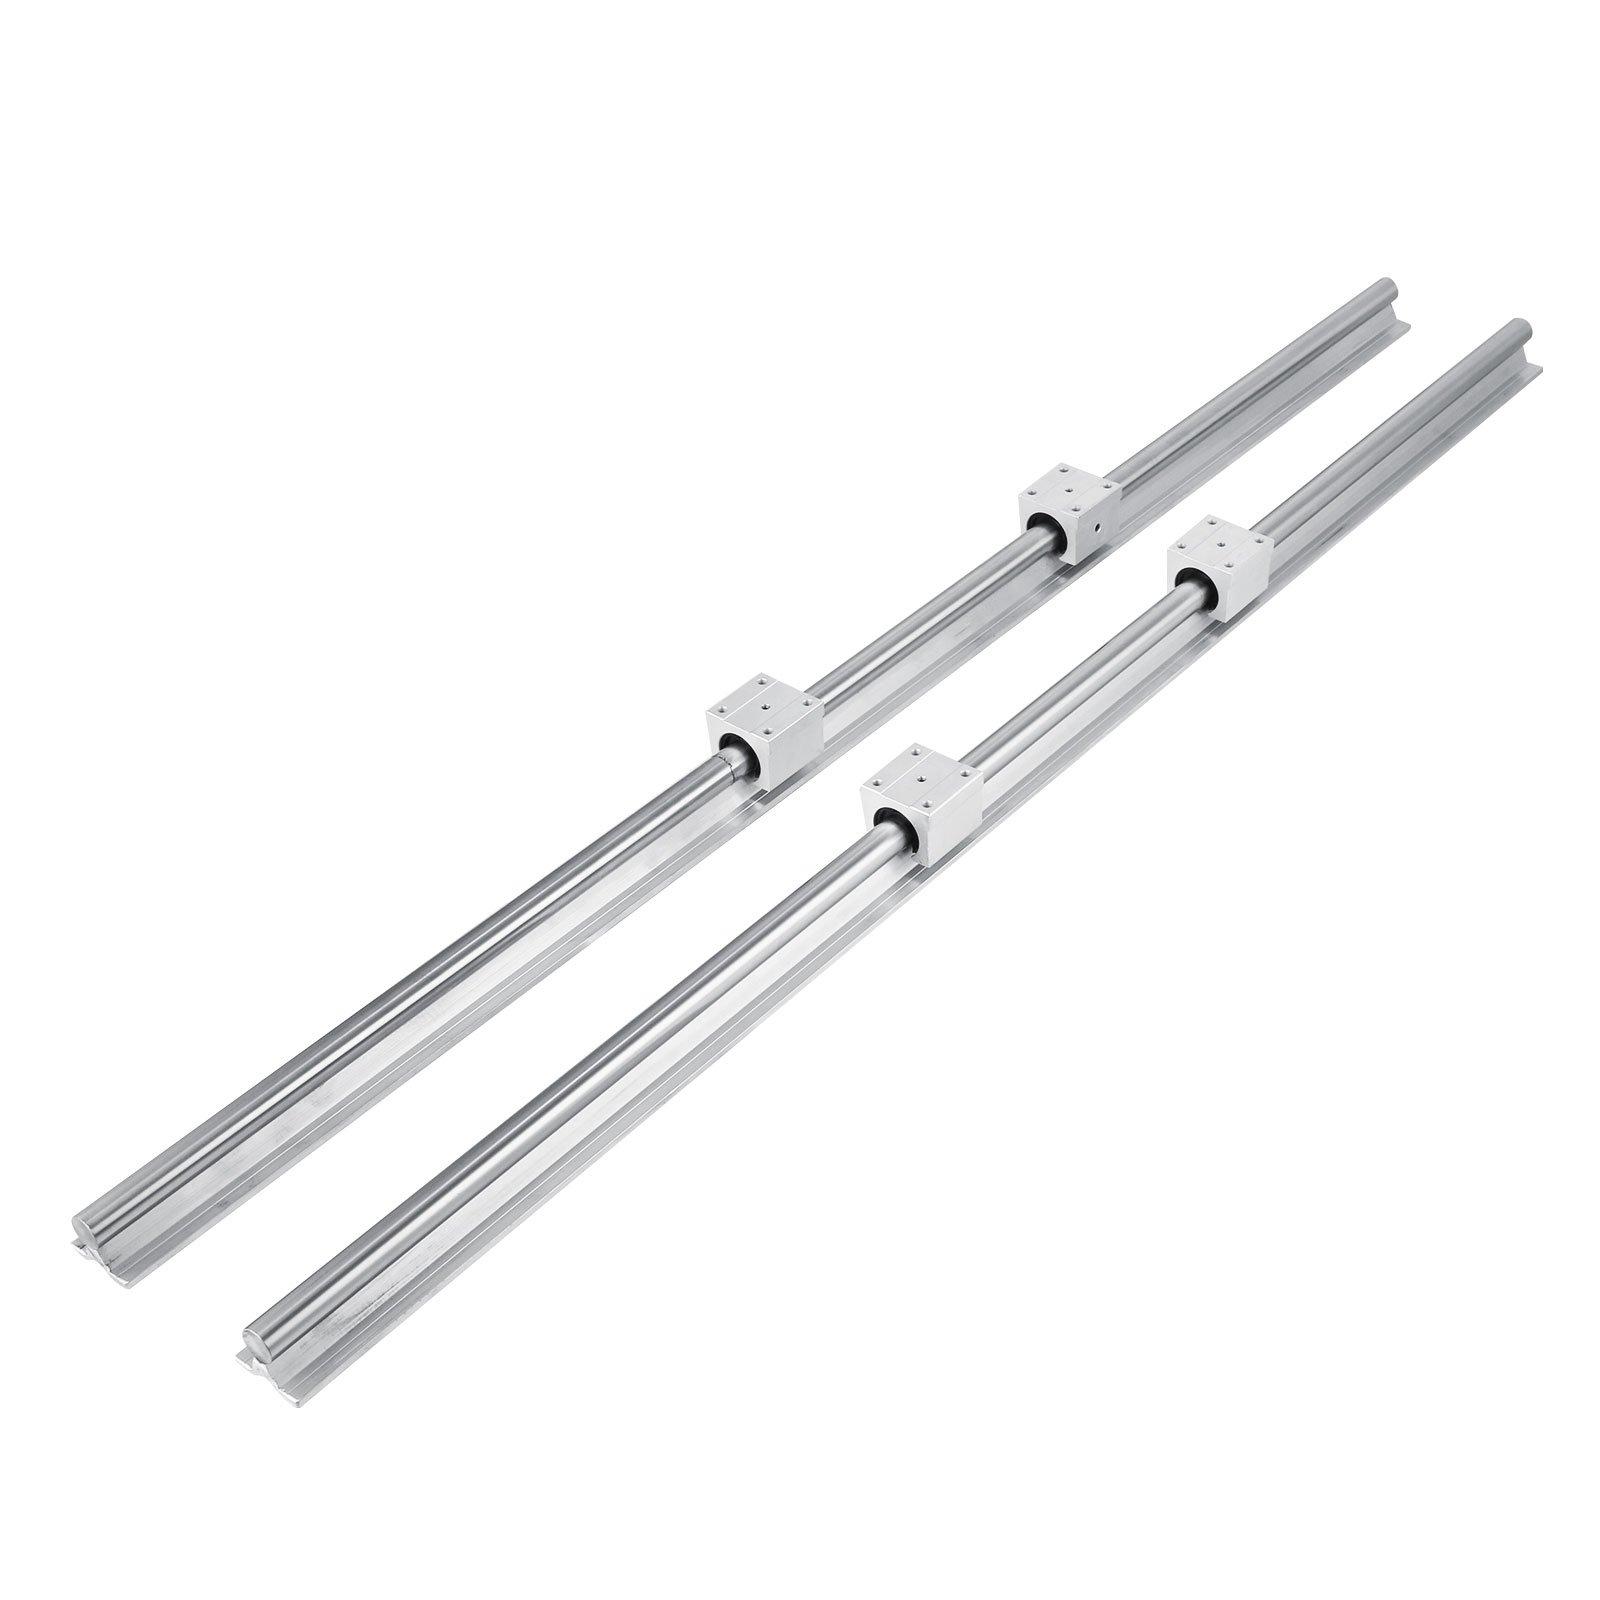 SBR16-2000mm 2 linear rail+ballscrew RM1605-2000mm+1 set BK//BF12 end bearing CNC